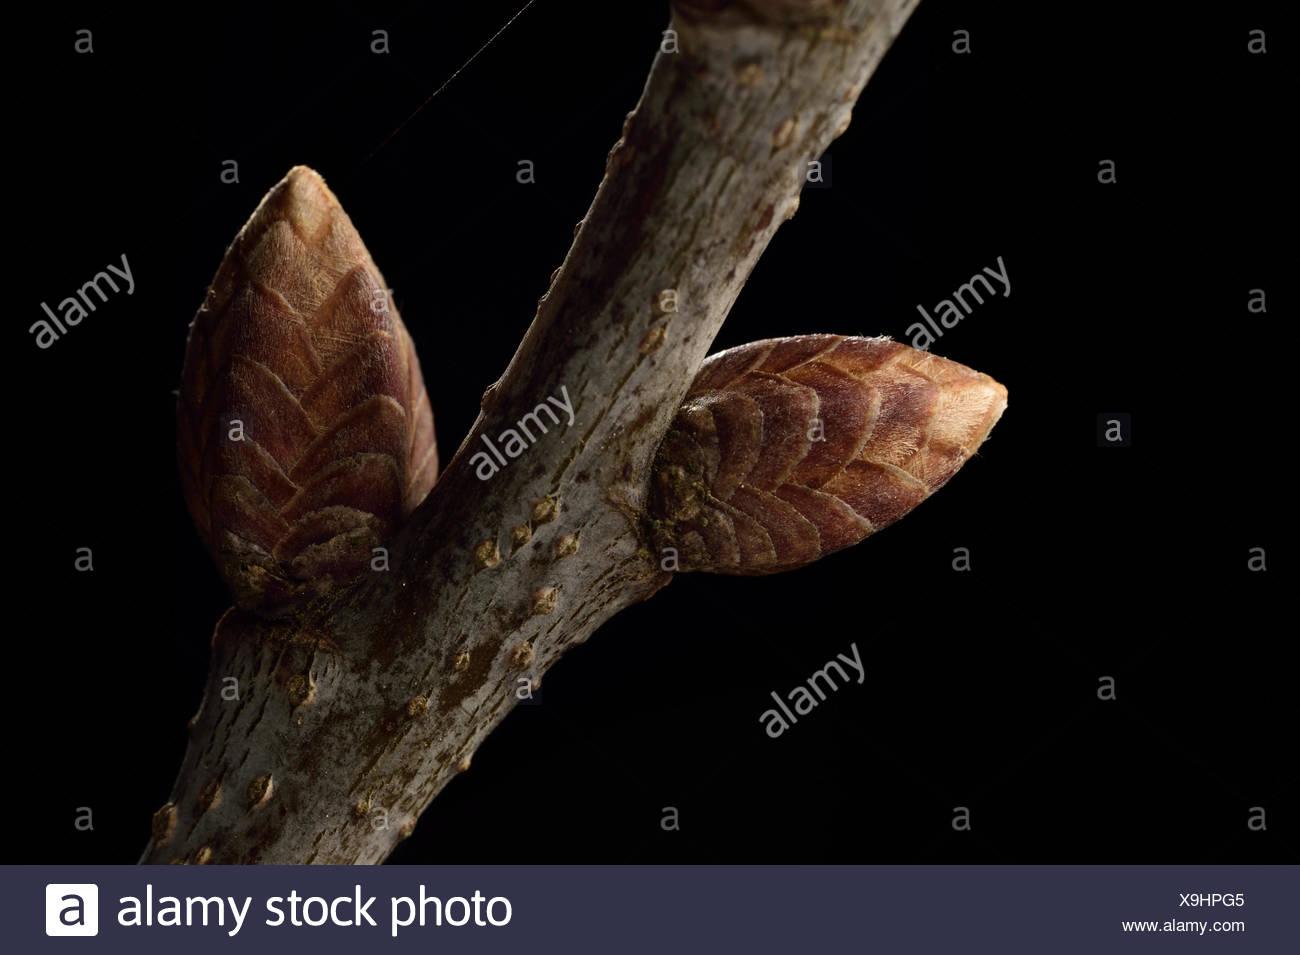 Buds of English oak tree (Quercus robur)  Niedersechsische Elbtalaue Biosphere Reserve, Elbe Valley, Lower Saxony, Germany, Apri - Stock Image